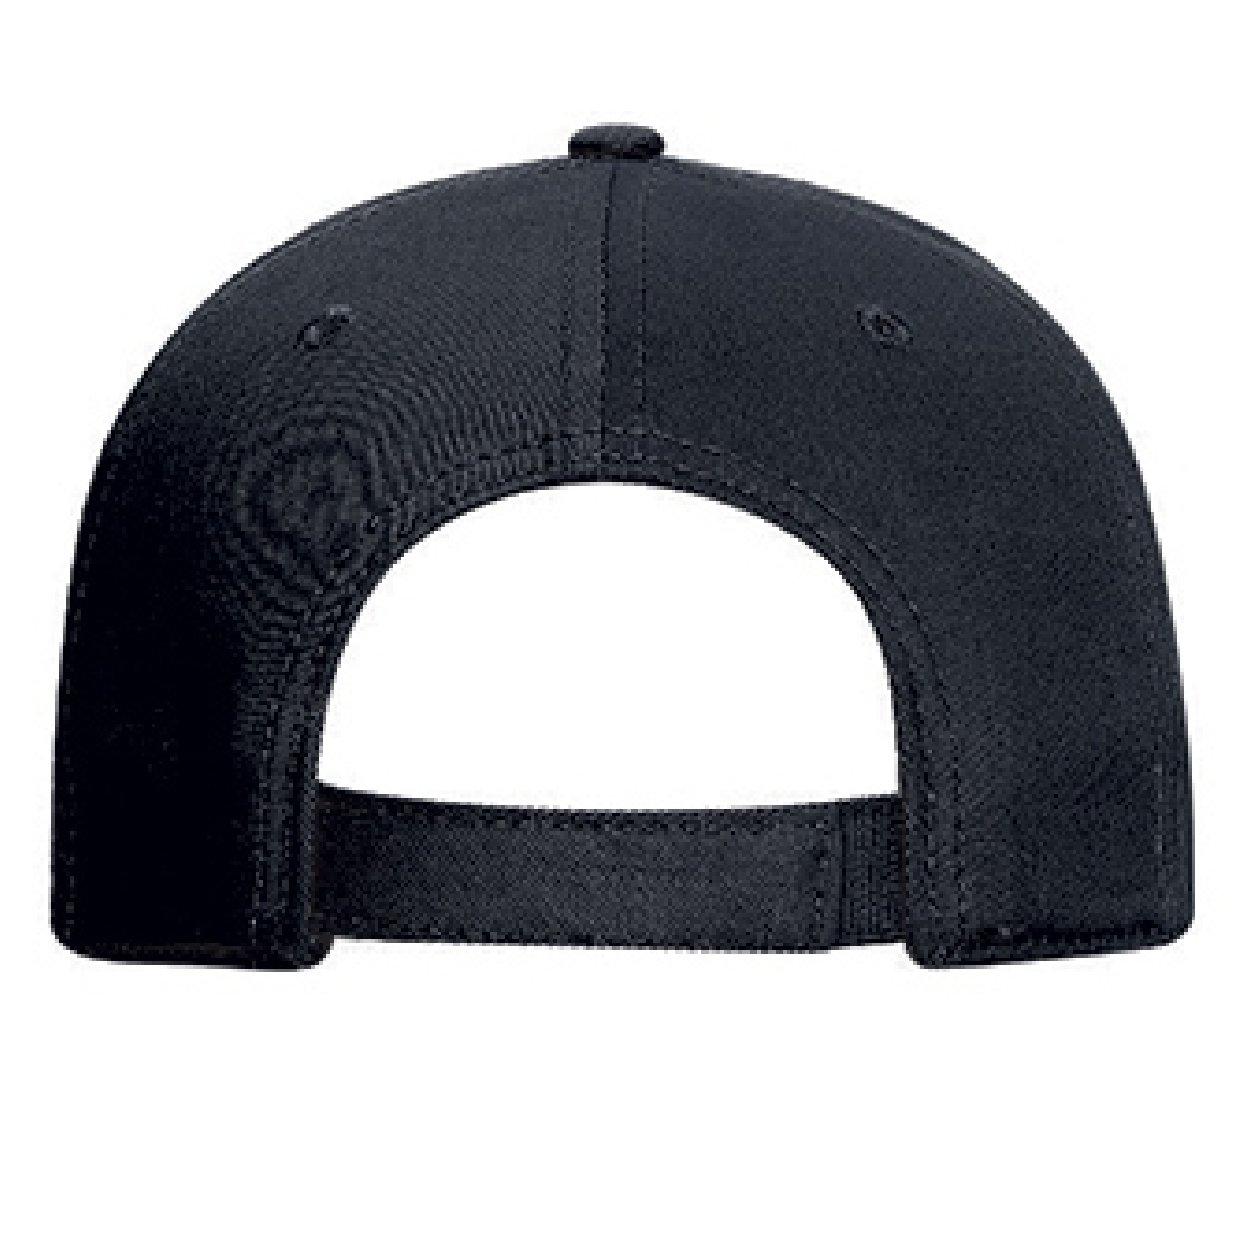 Spiffy Custom Gifts U.S Navy Blue Angels Embroidered Pro Sport Baseball Cap